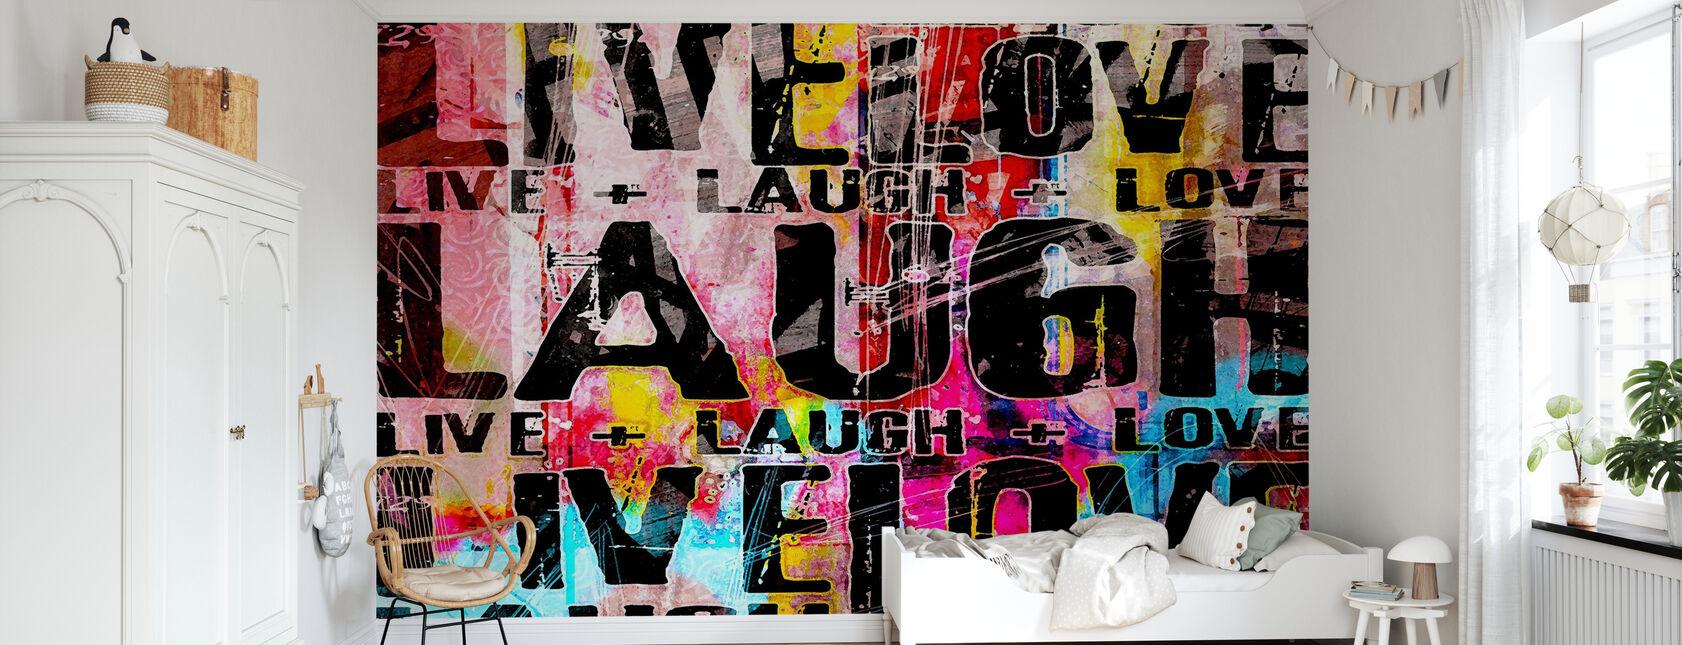 Live Laugh Love - Wallpaper - Kids Room